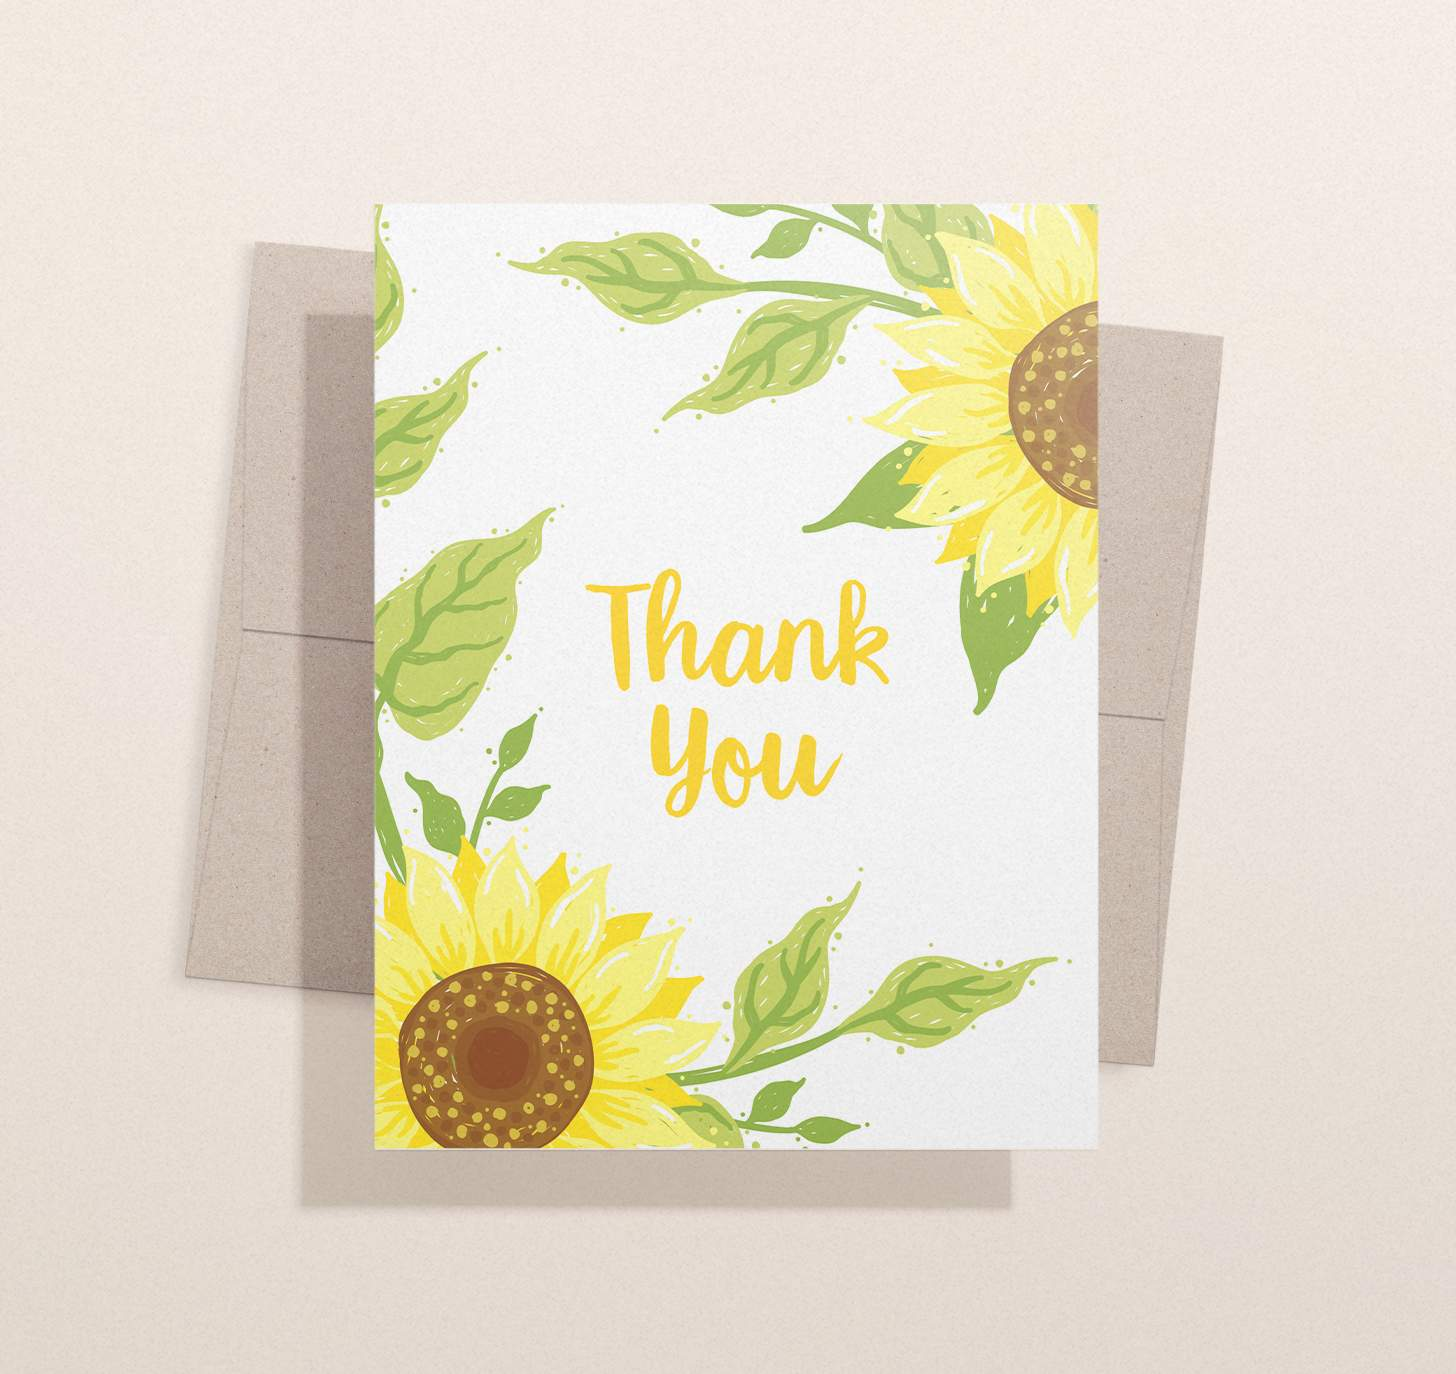 Yellow sunflower split design with envelope